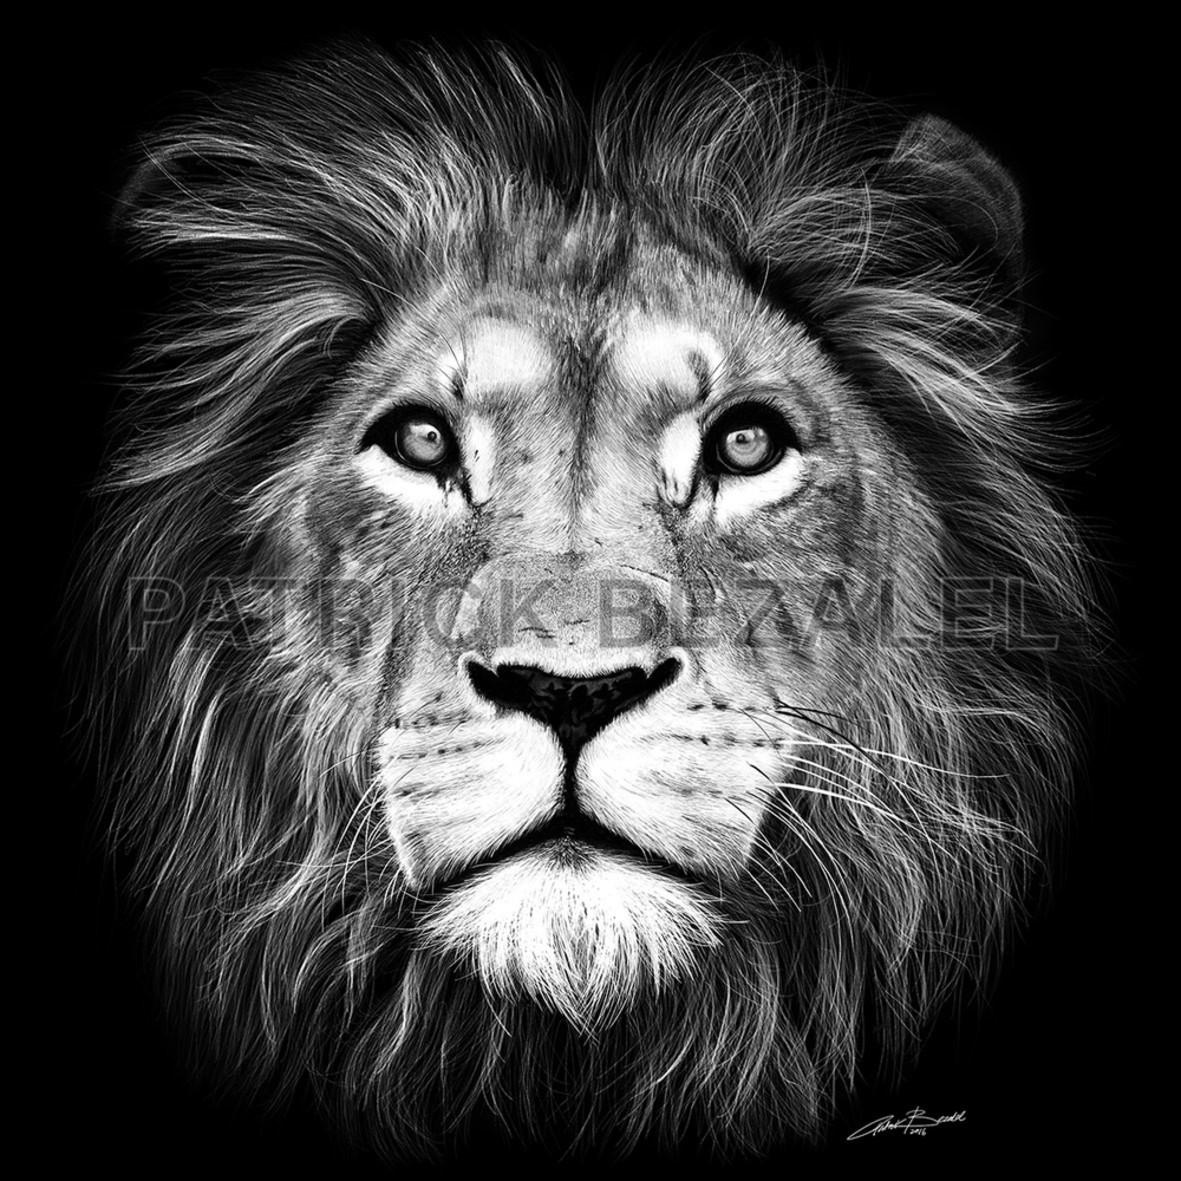 Lion of judah new 0.3x0.3m low c28yr8